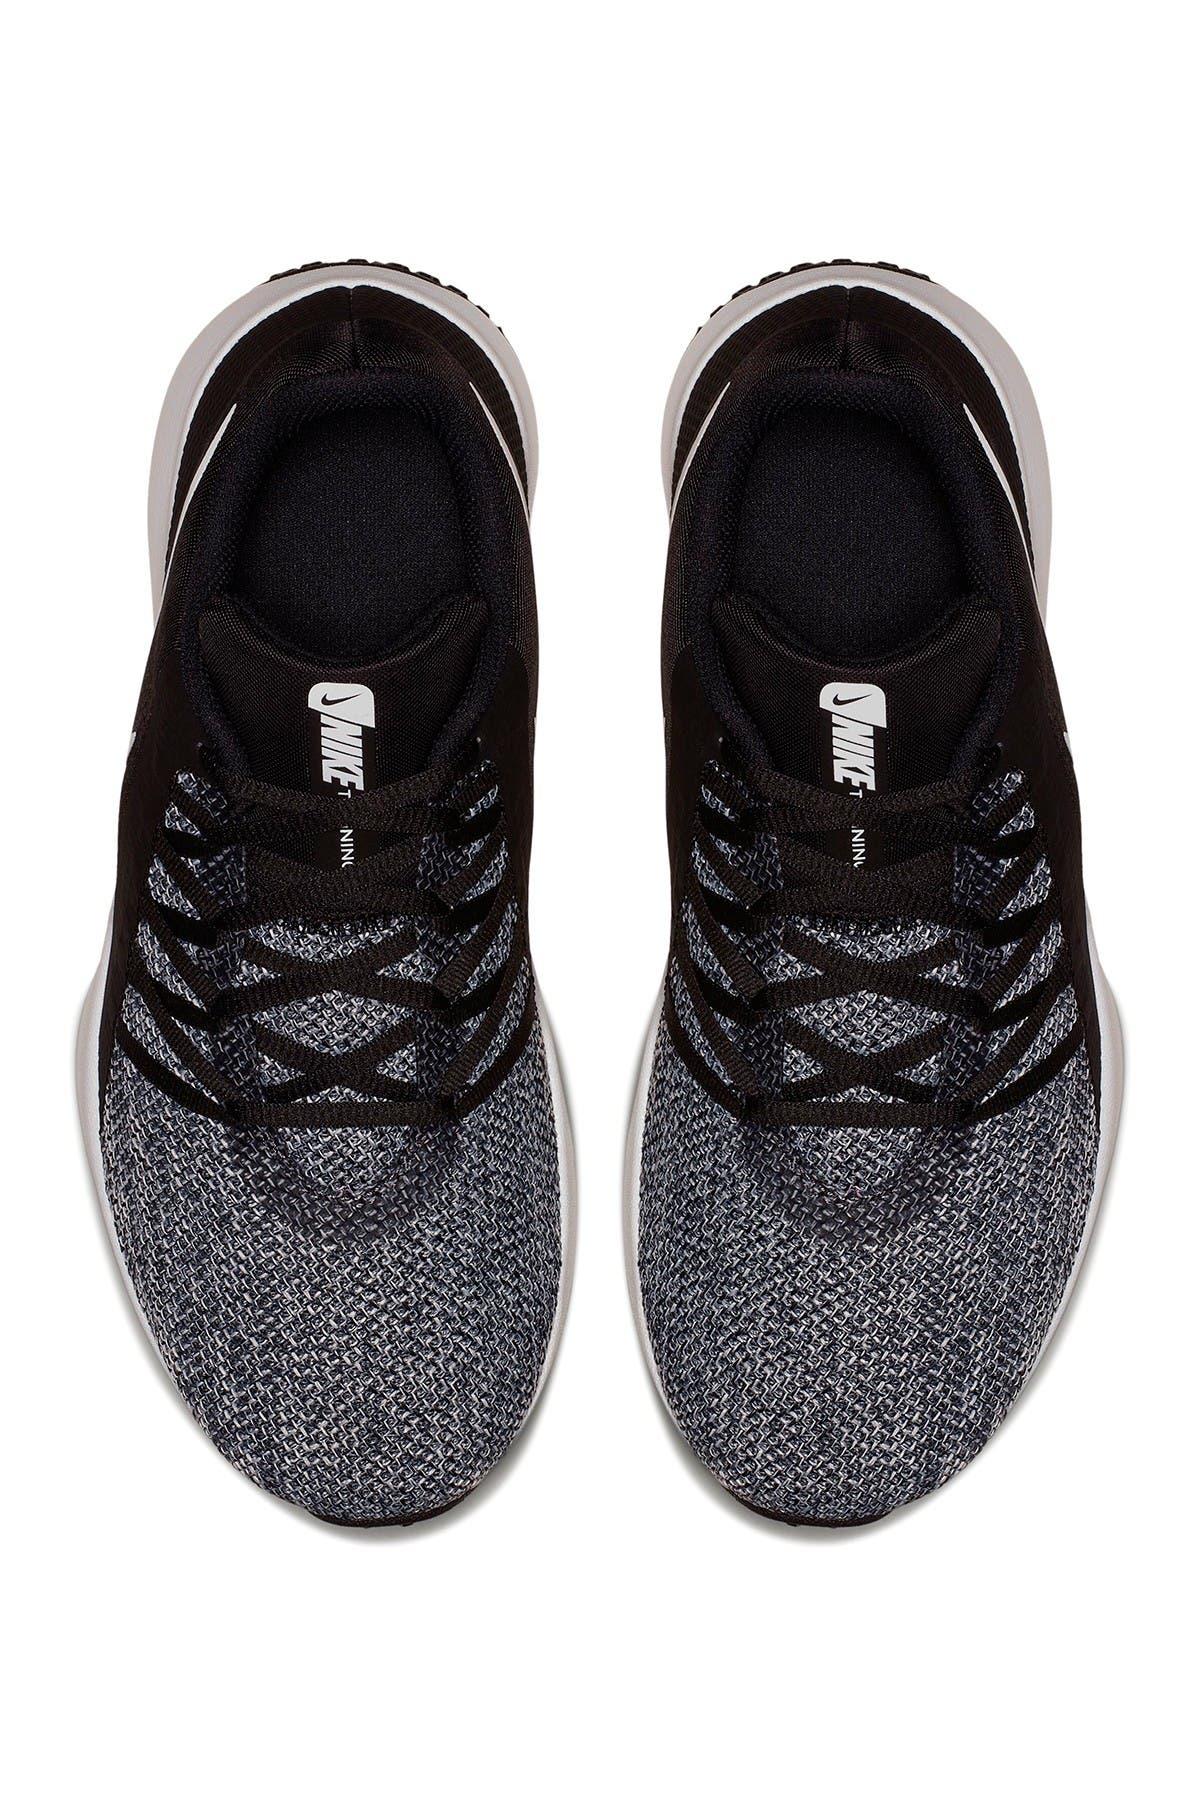 Nike | Varsity Compete Training Sneaker